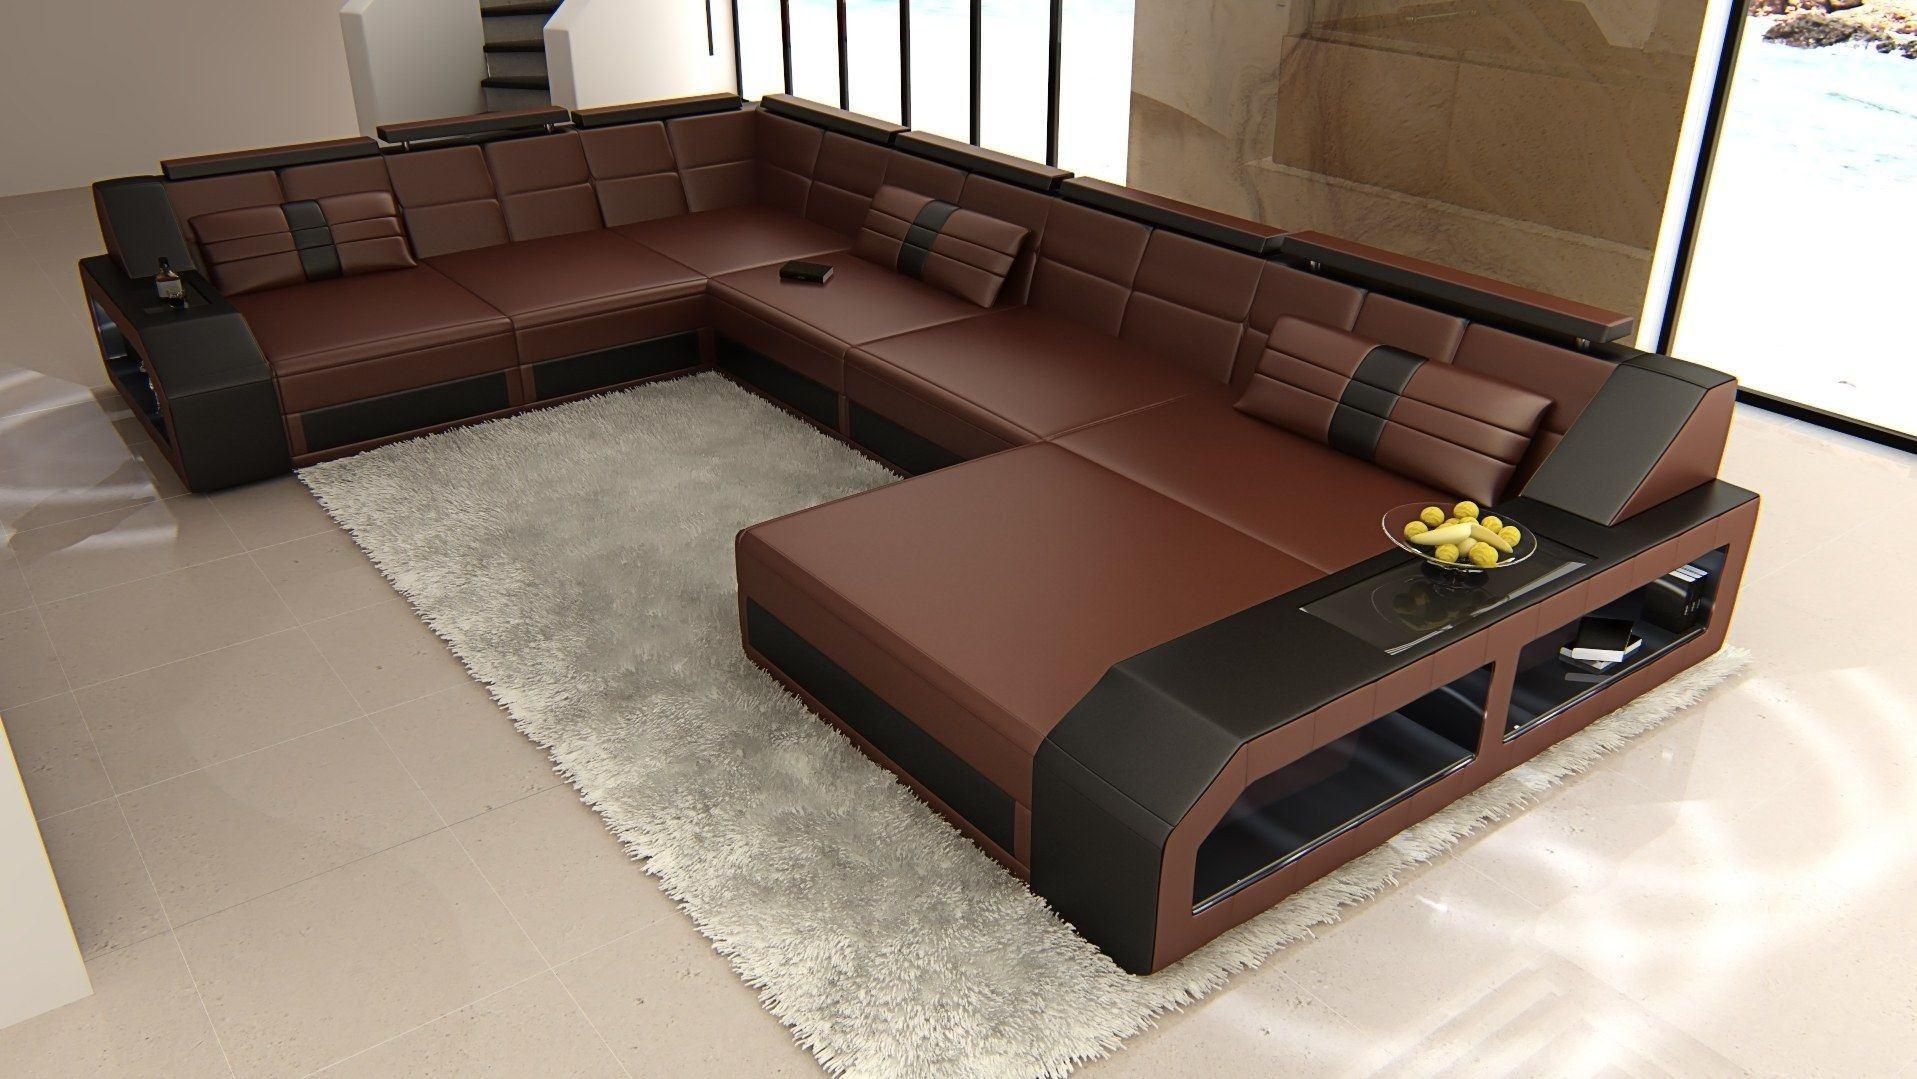 xxl wohnlandschaft matera xxl dunkelbraun schwarz. Black Bedroom Furniture Sets. Home Design Ideas